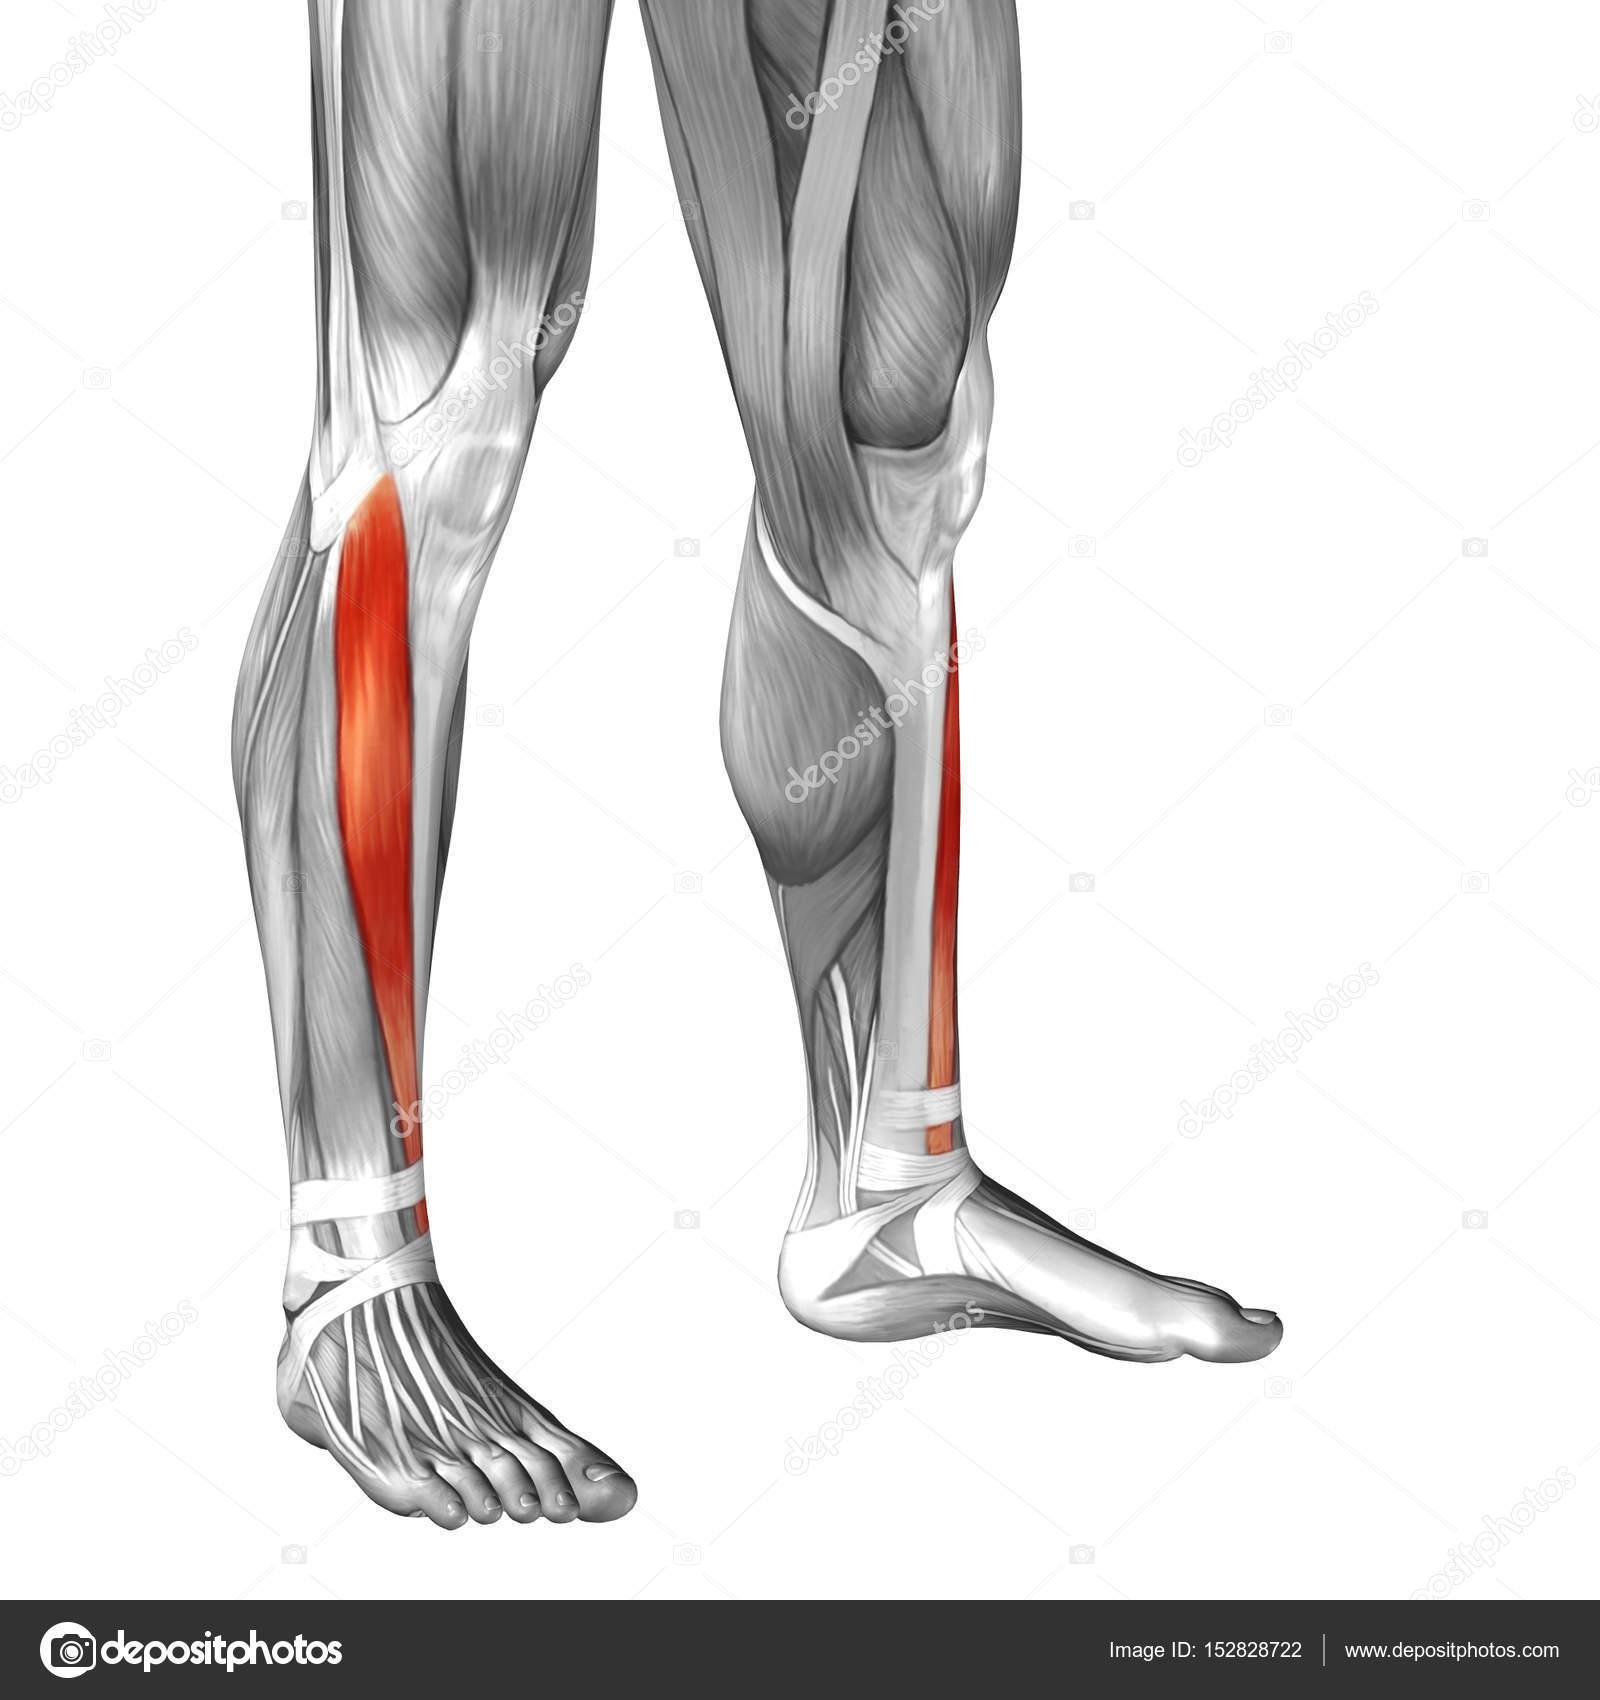 Human Lower Legs Anatomy Stock Photo Design36 152828722